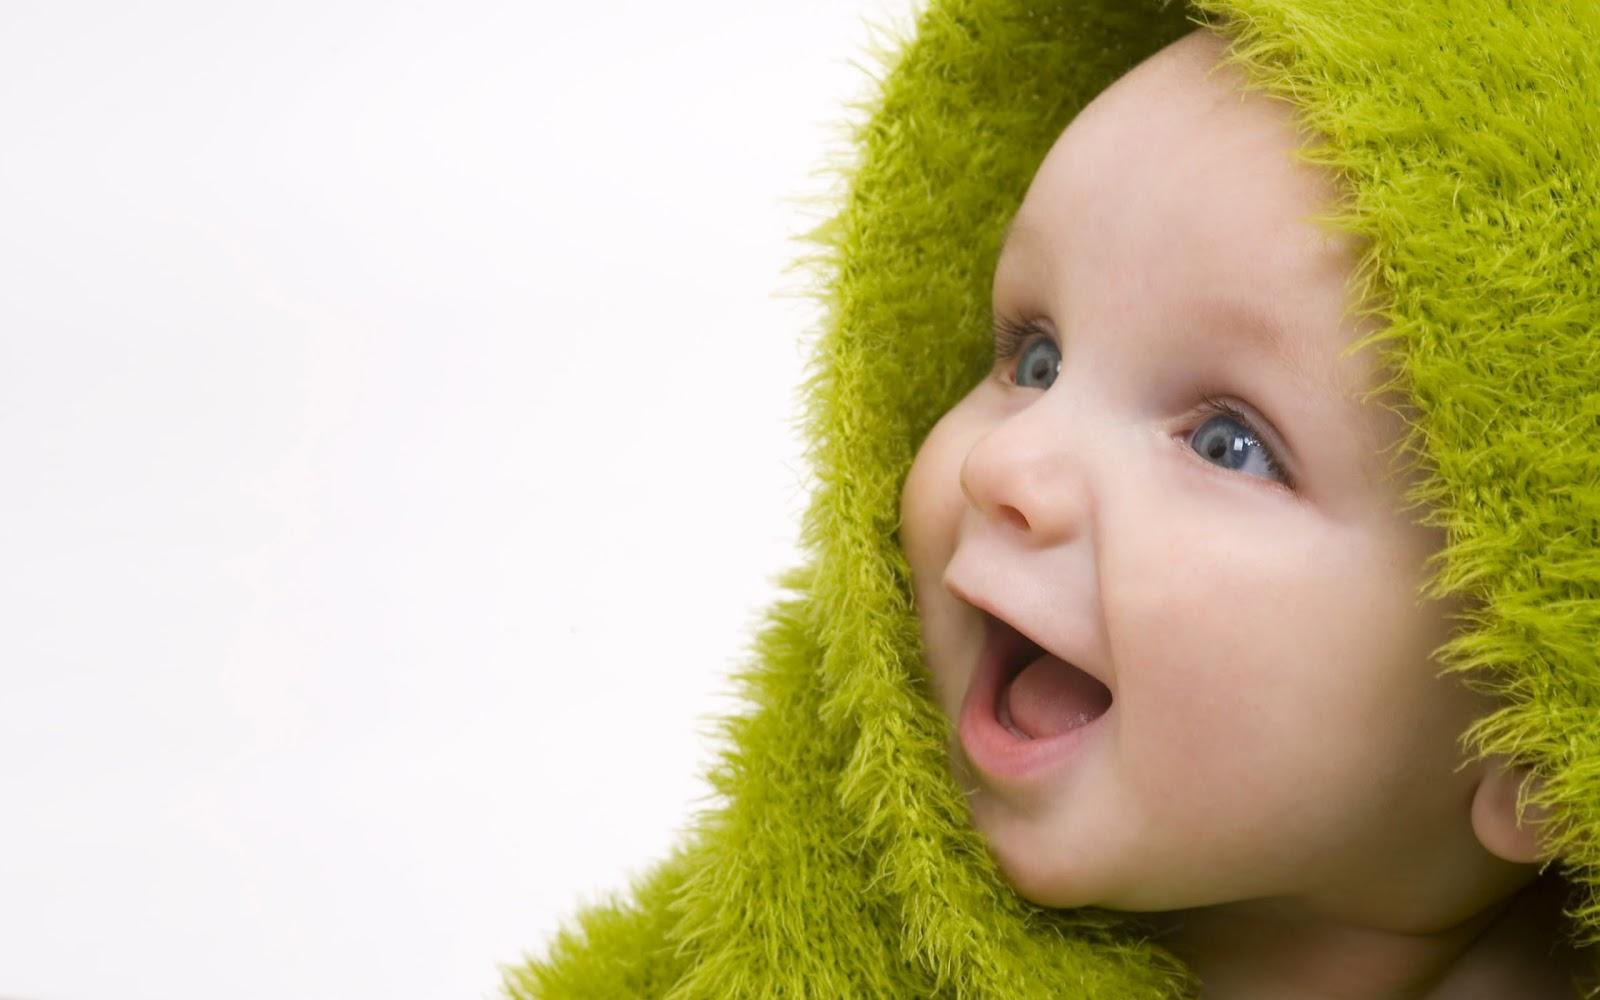 http://3.bp.blogspot.com/-2z0VSPH_RQw/T_BfIzhgygI/AAAAAAAAAH8/0HW7aWHu6cc/s1600/Cute+Baby+Wallpaper.jpg